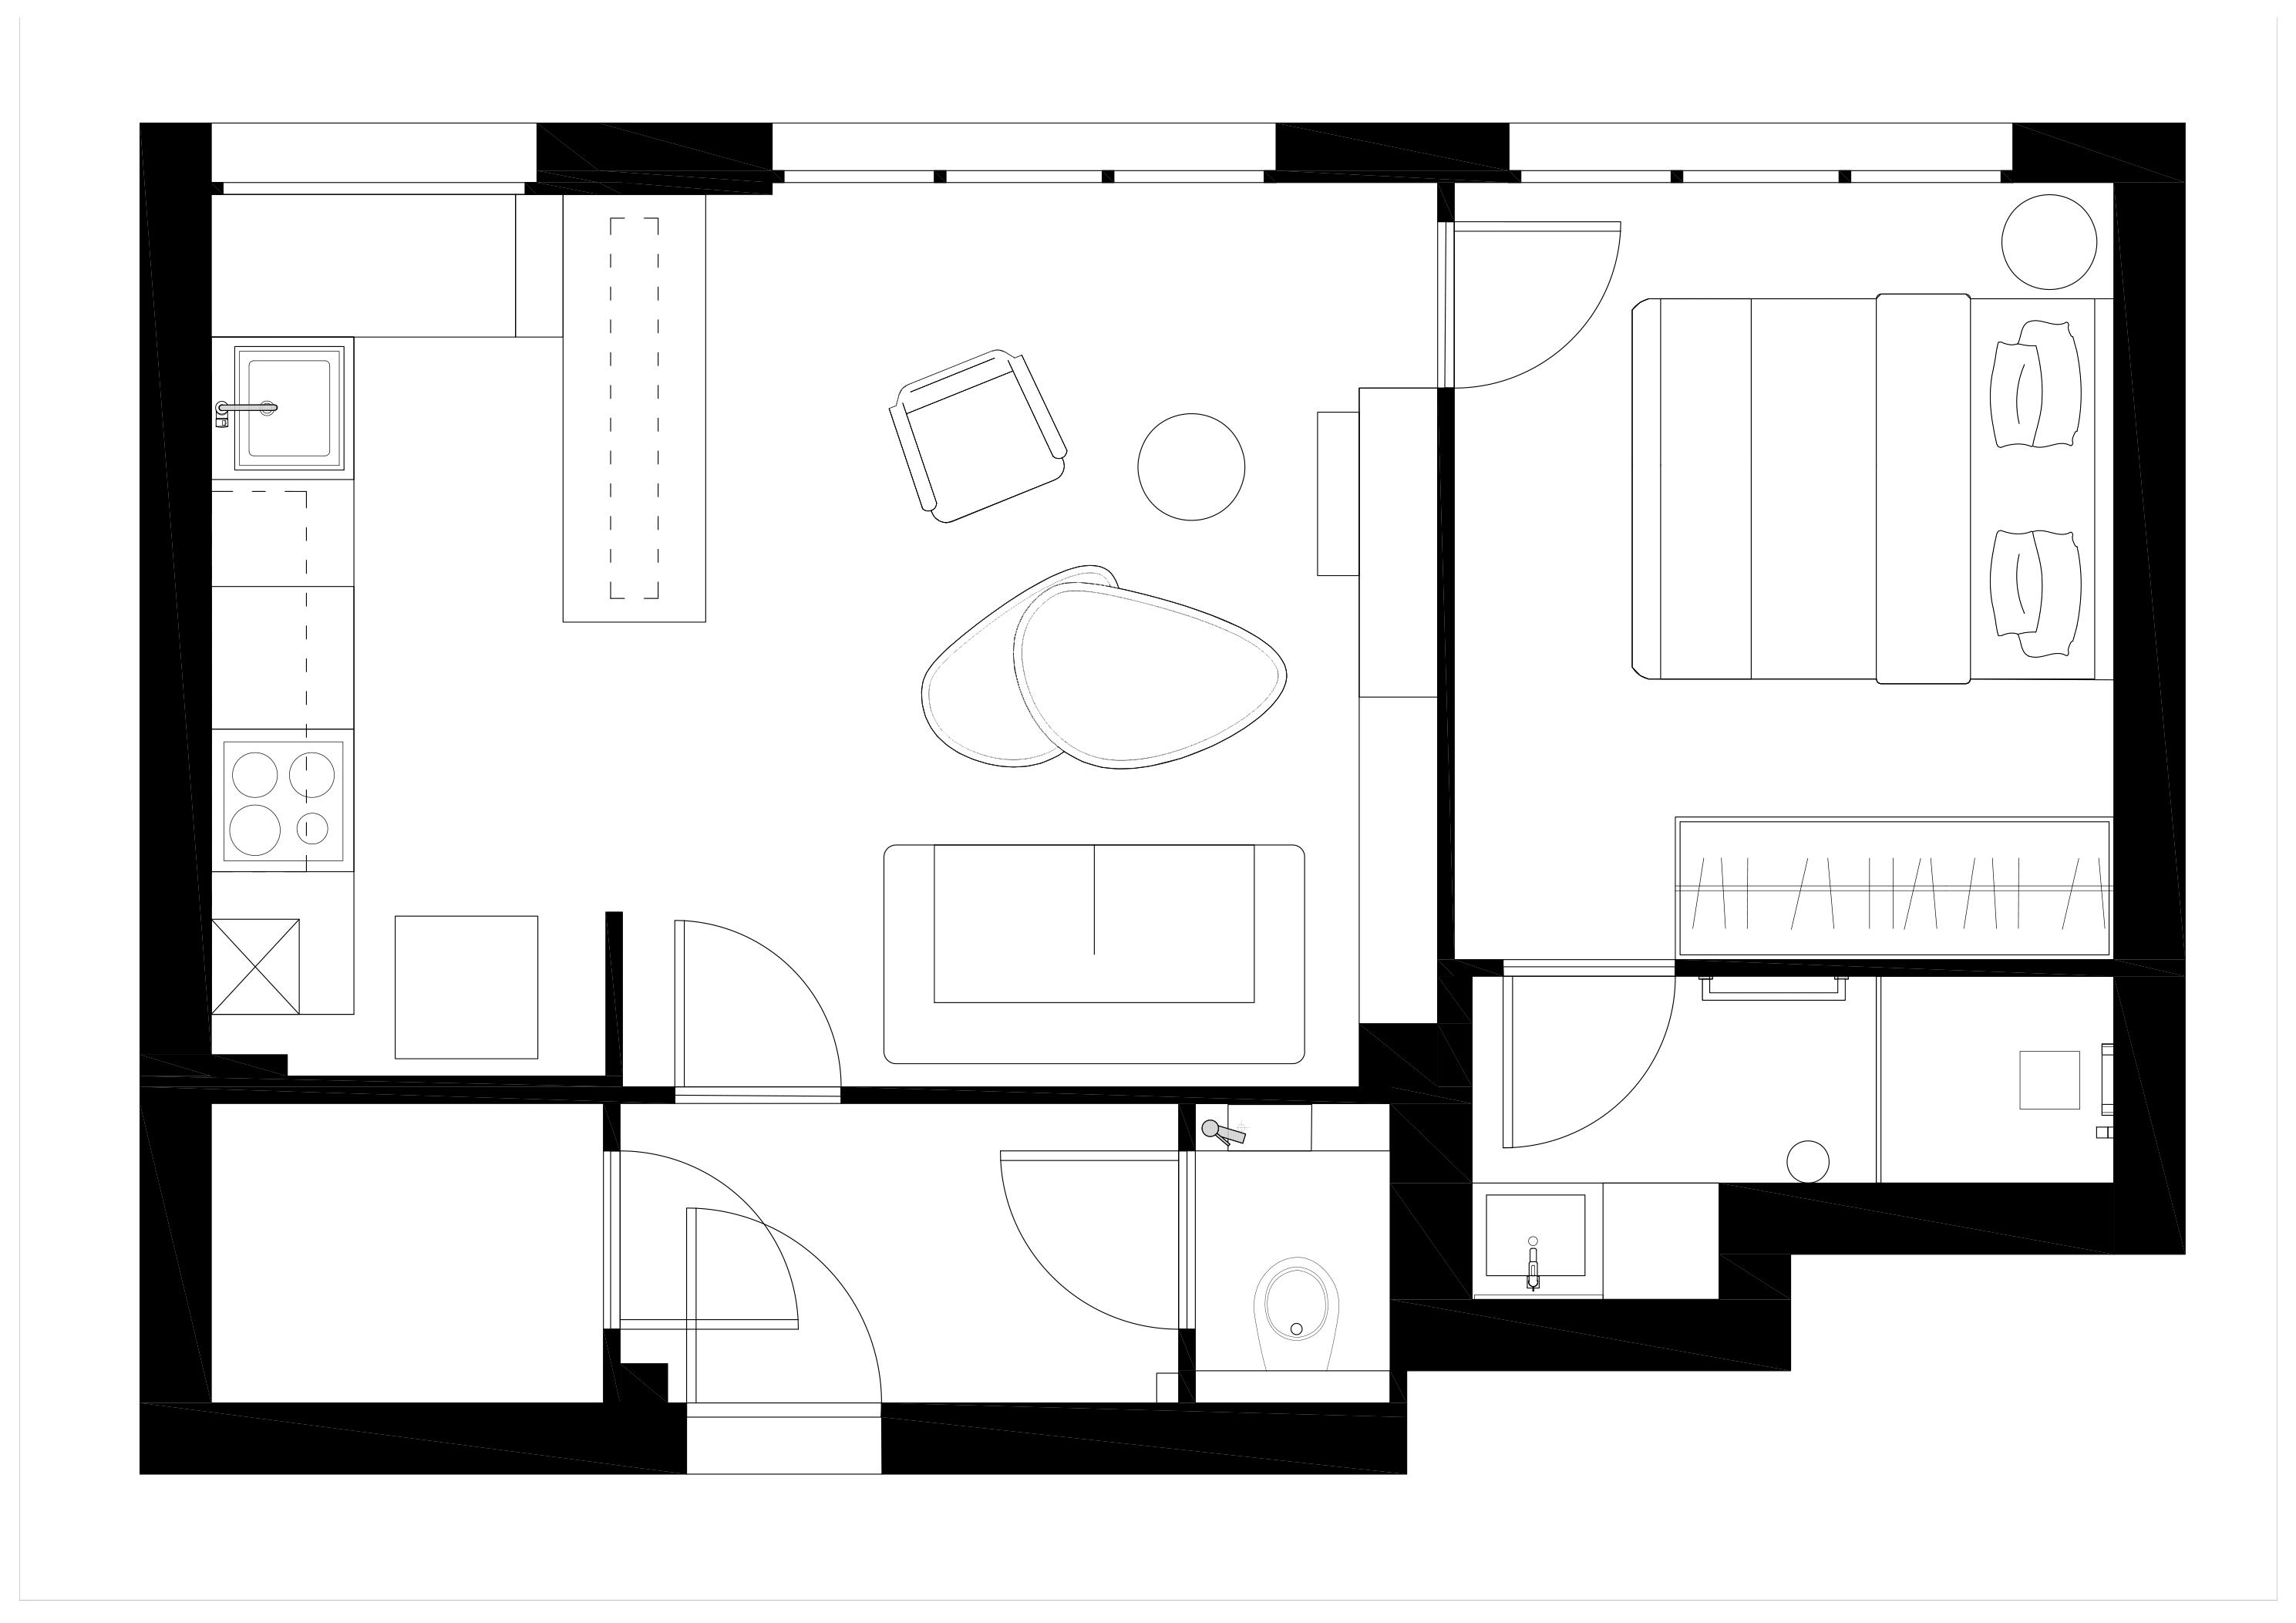 D:FREELANCEFONTENAYDWGprojet-fontenay plan site 2 (1)